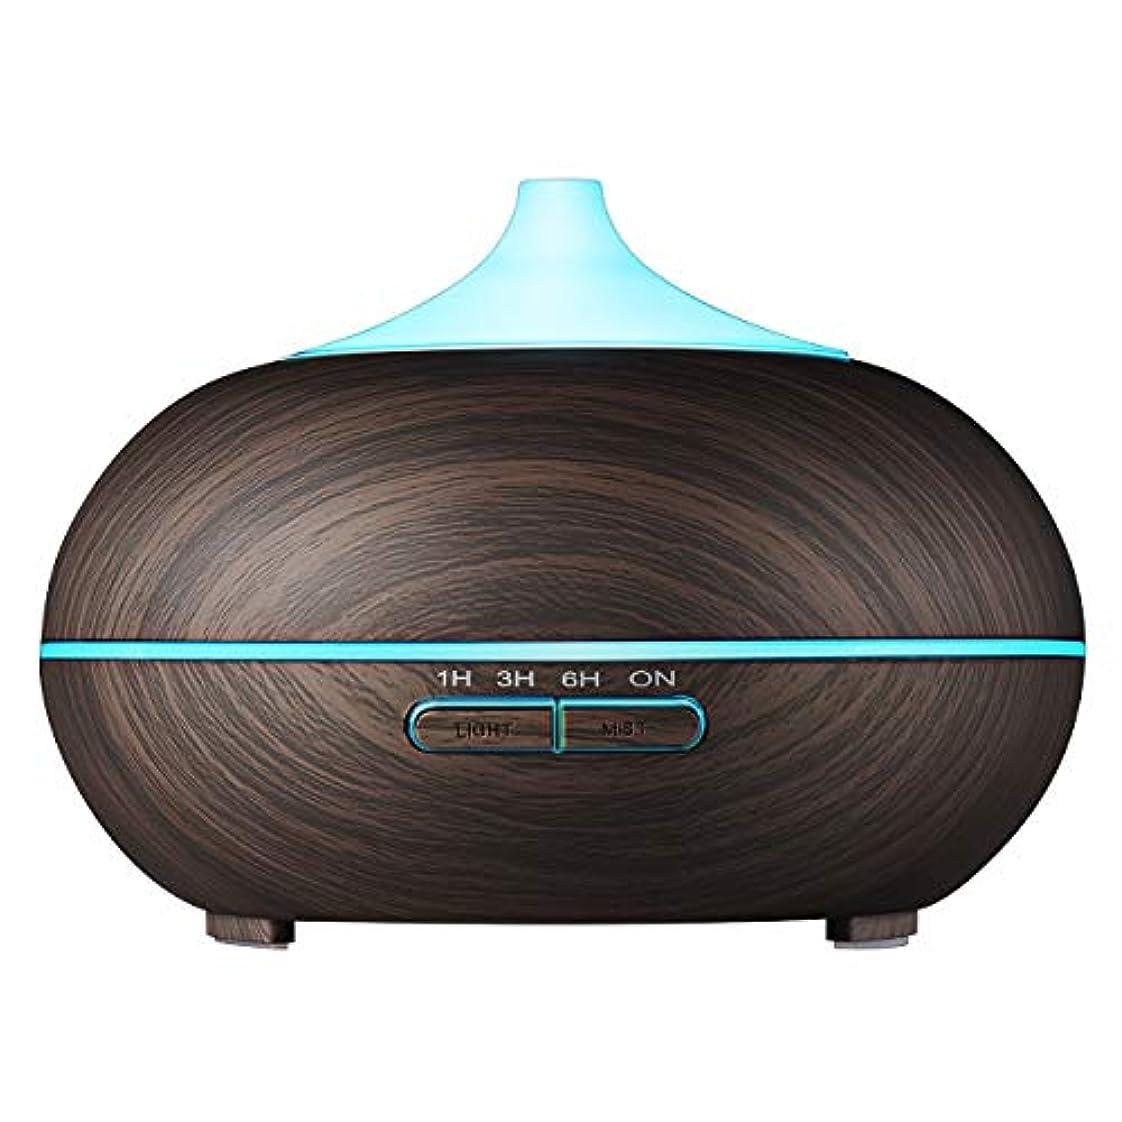 VicTsing 300 ml Aromatherapy Essential Oil Diffuser、超音波クールなミスト加湿器with 14 – カラーLEDライト、木目デザイン